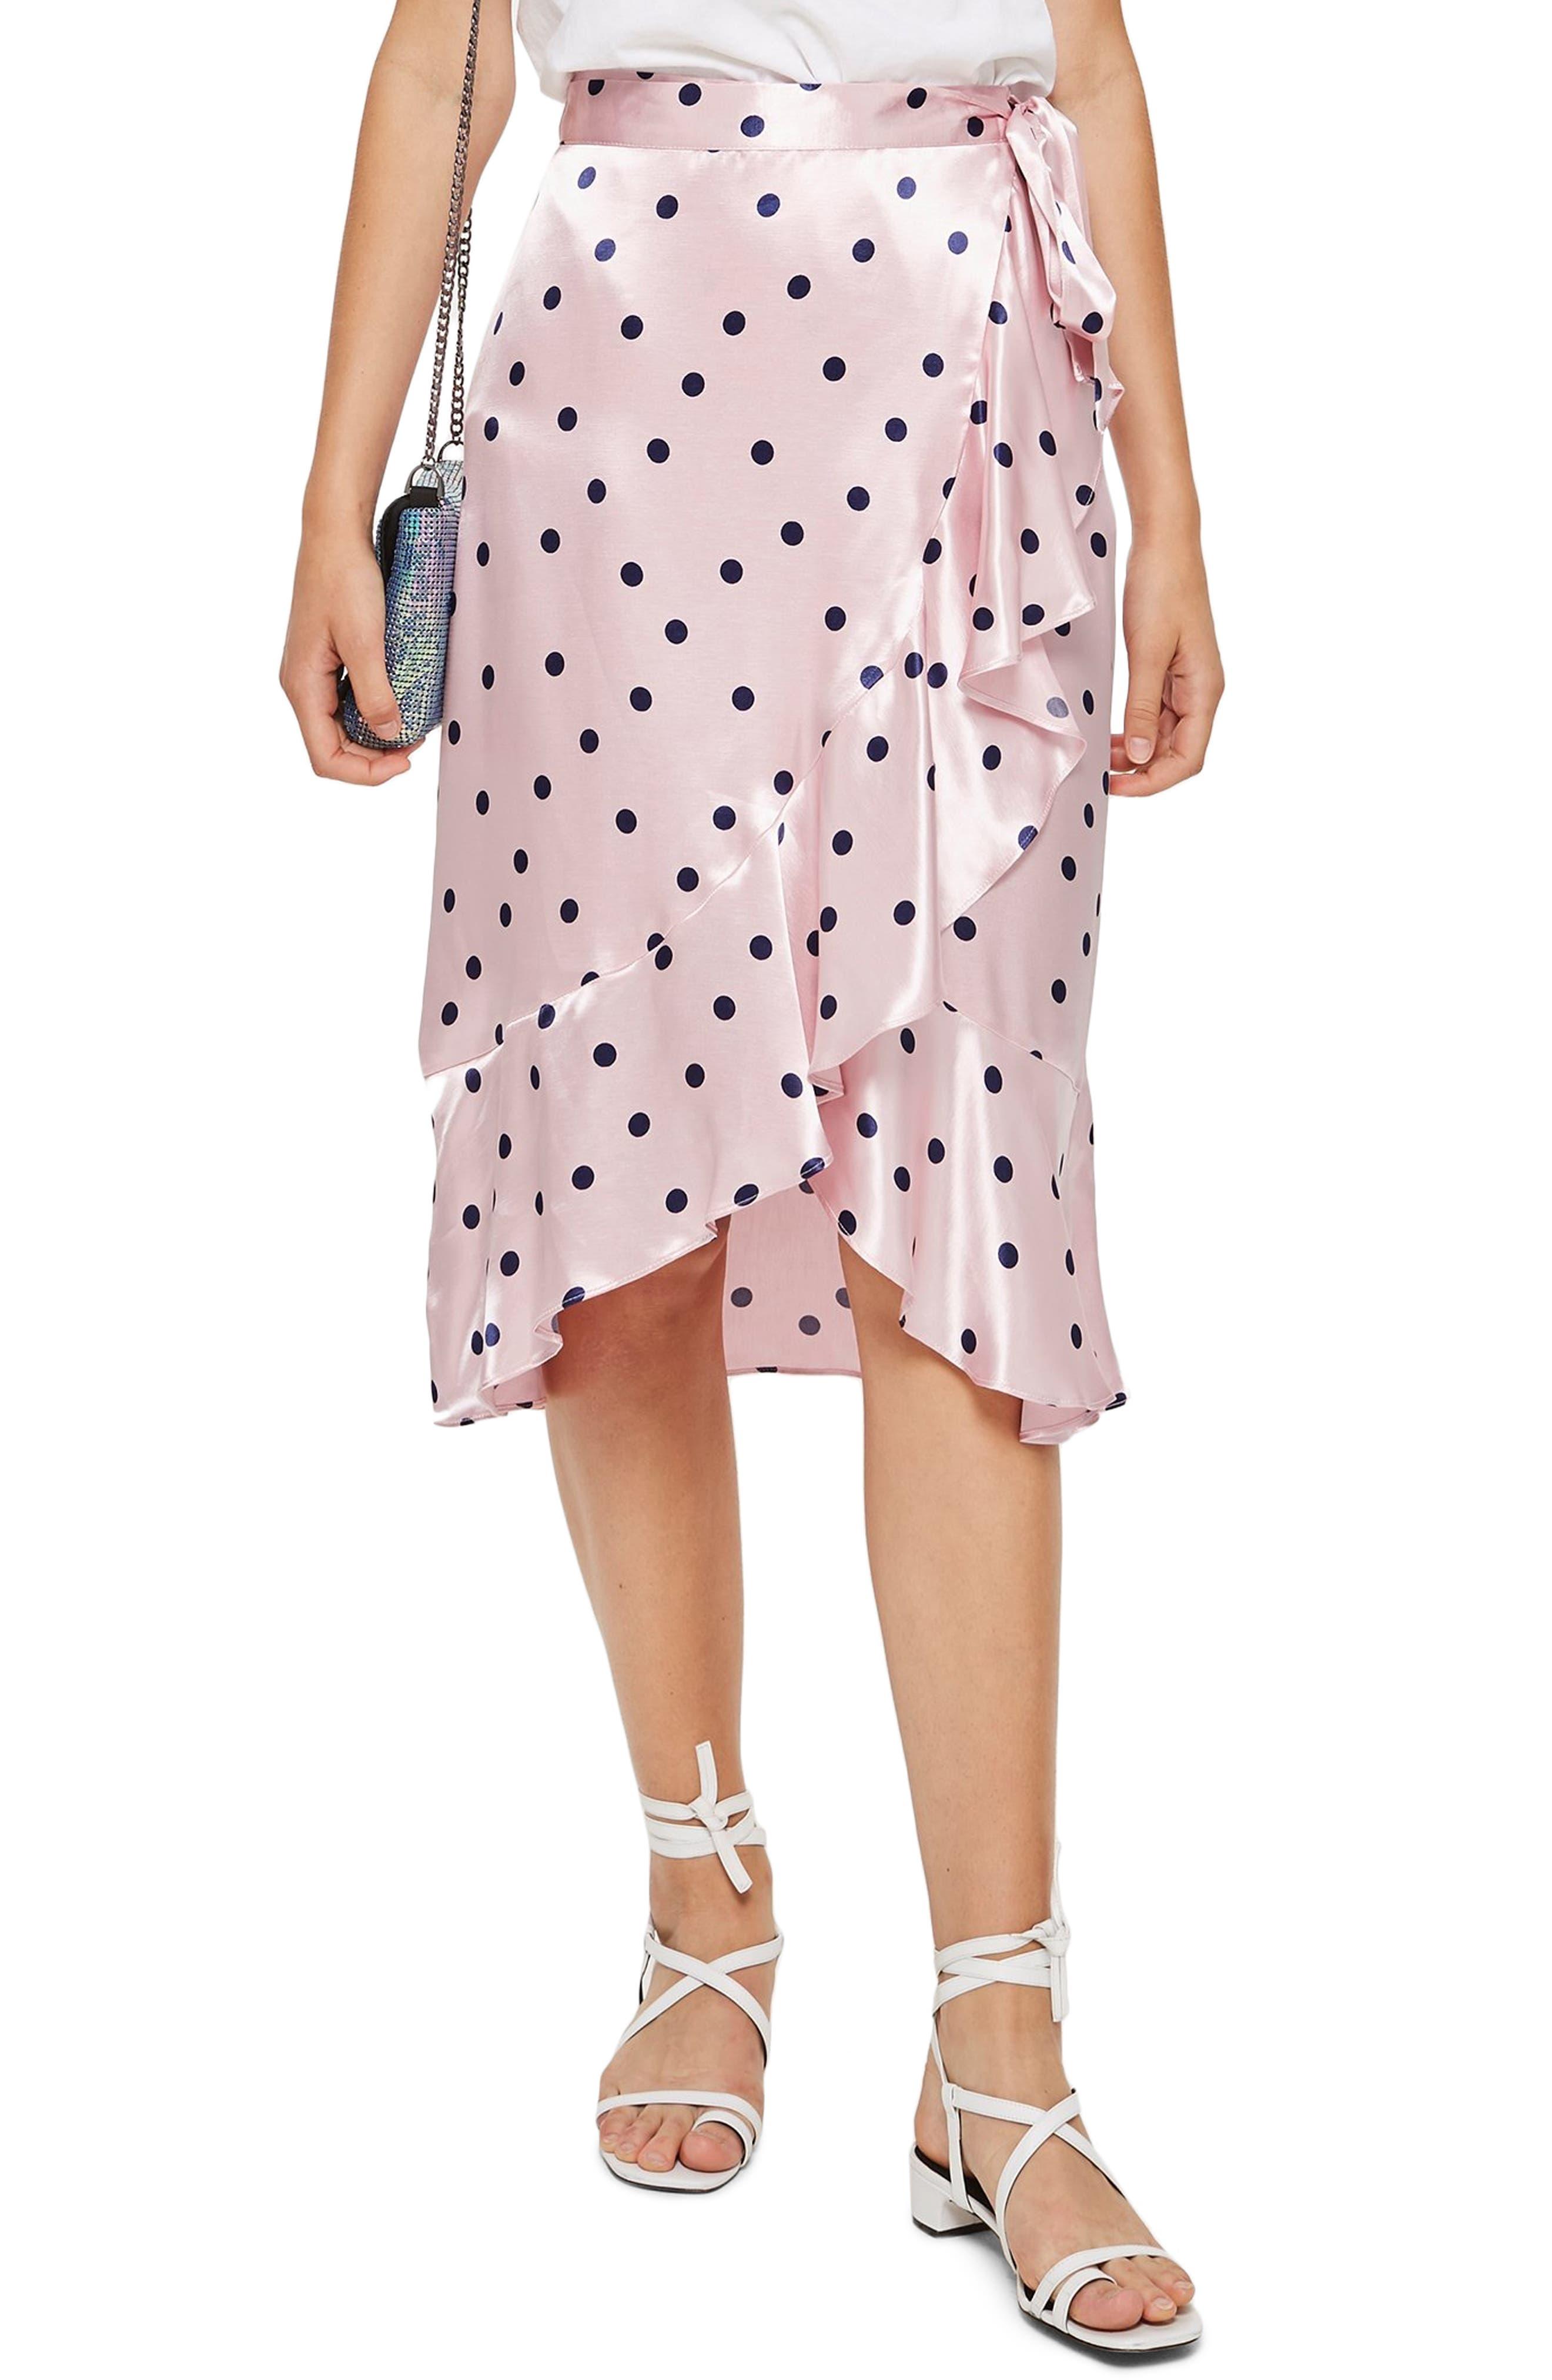 Satin Spot Ruffle Skirt,                             Main thumbnail 1, color,                             PINK MULTI